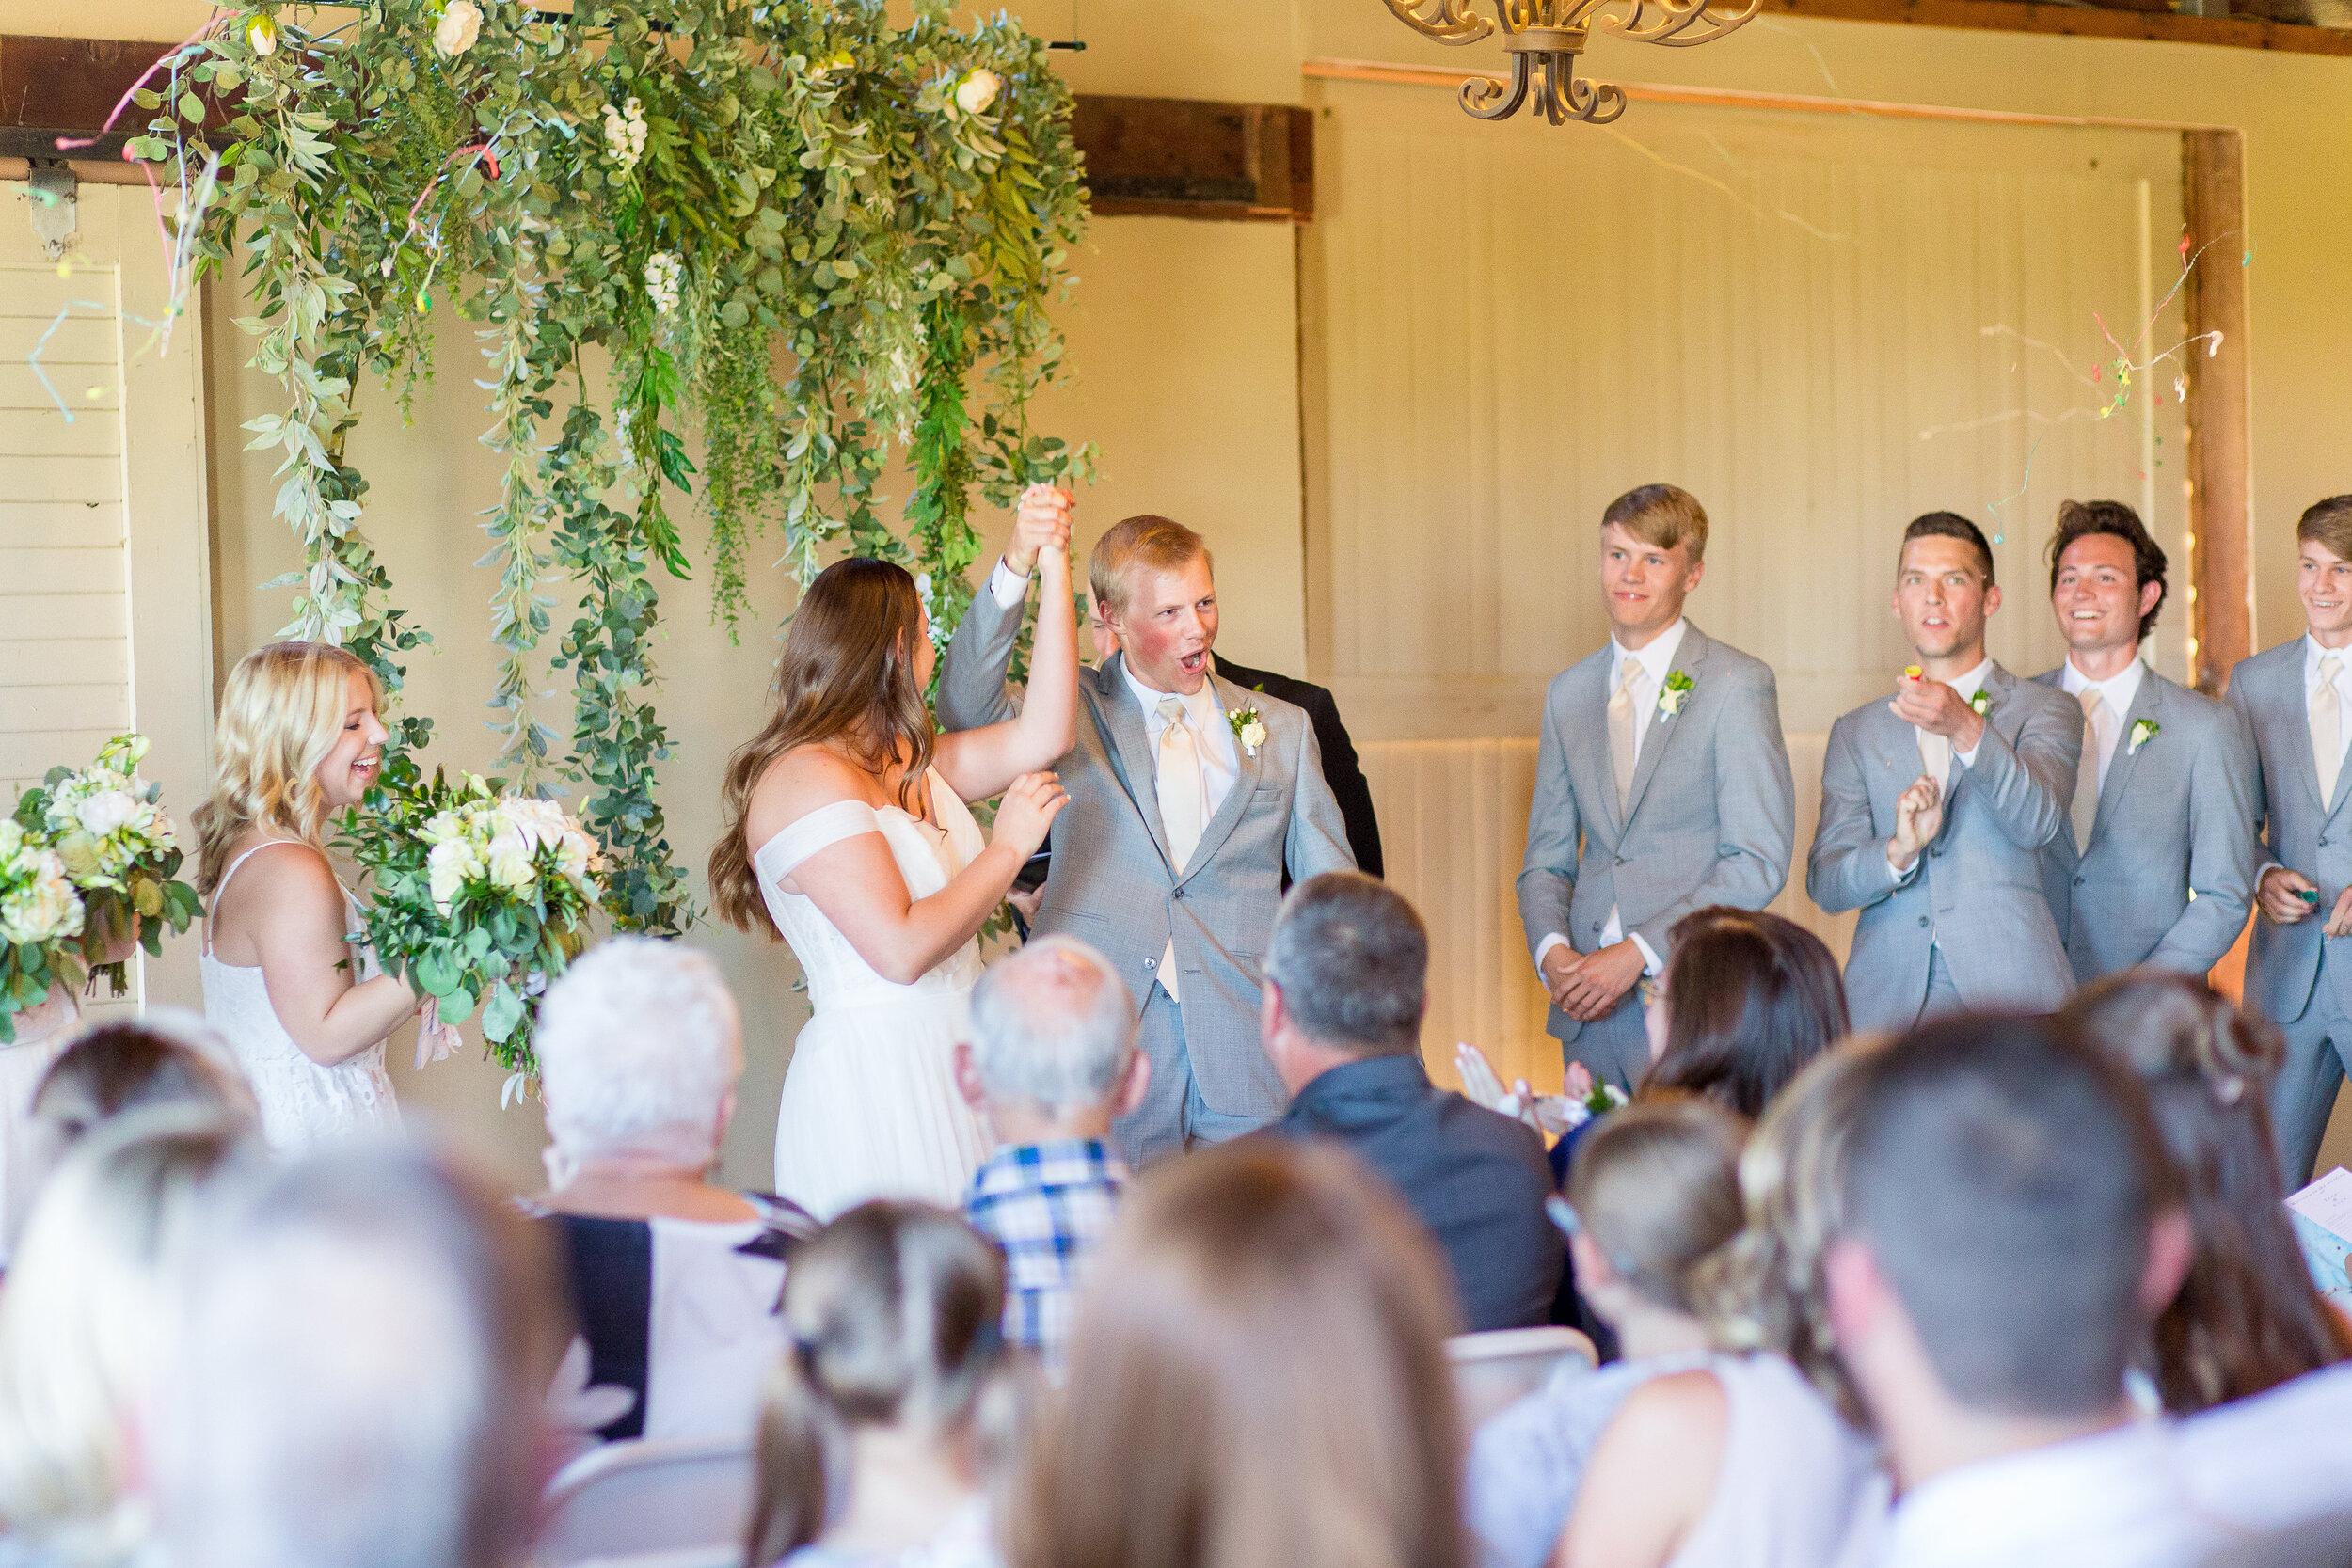 spokane bride and groom first kiss celebration